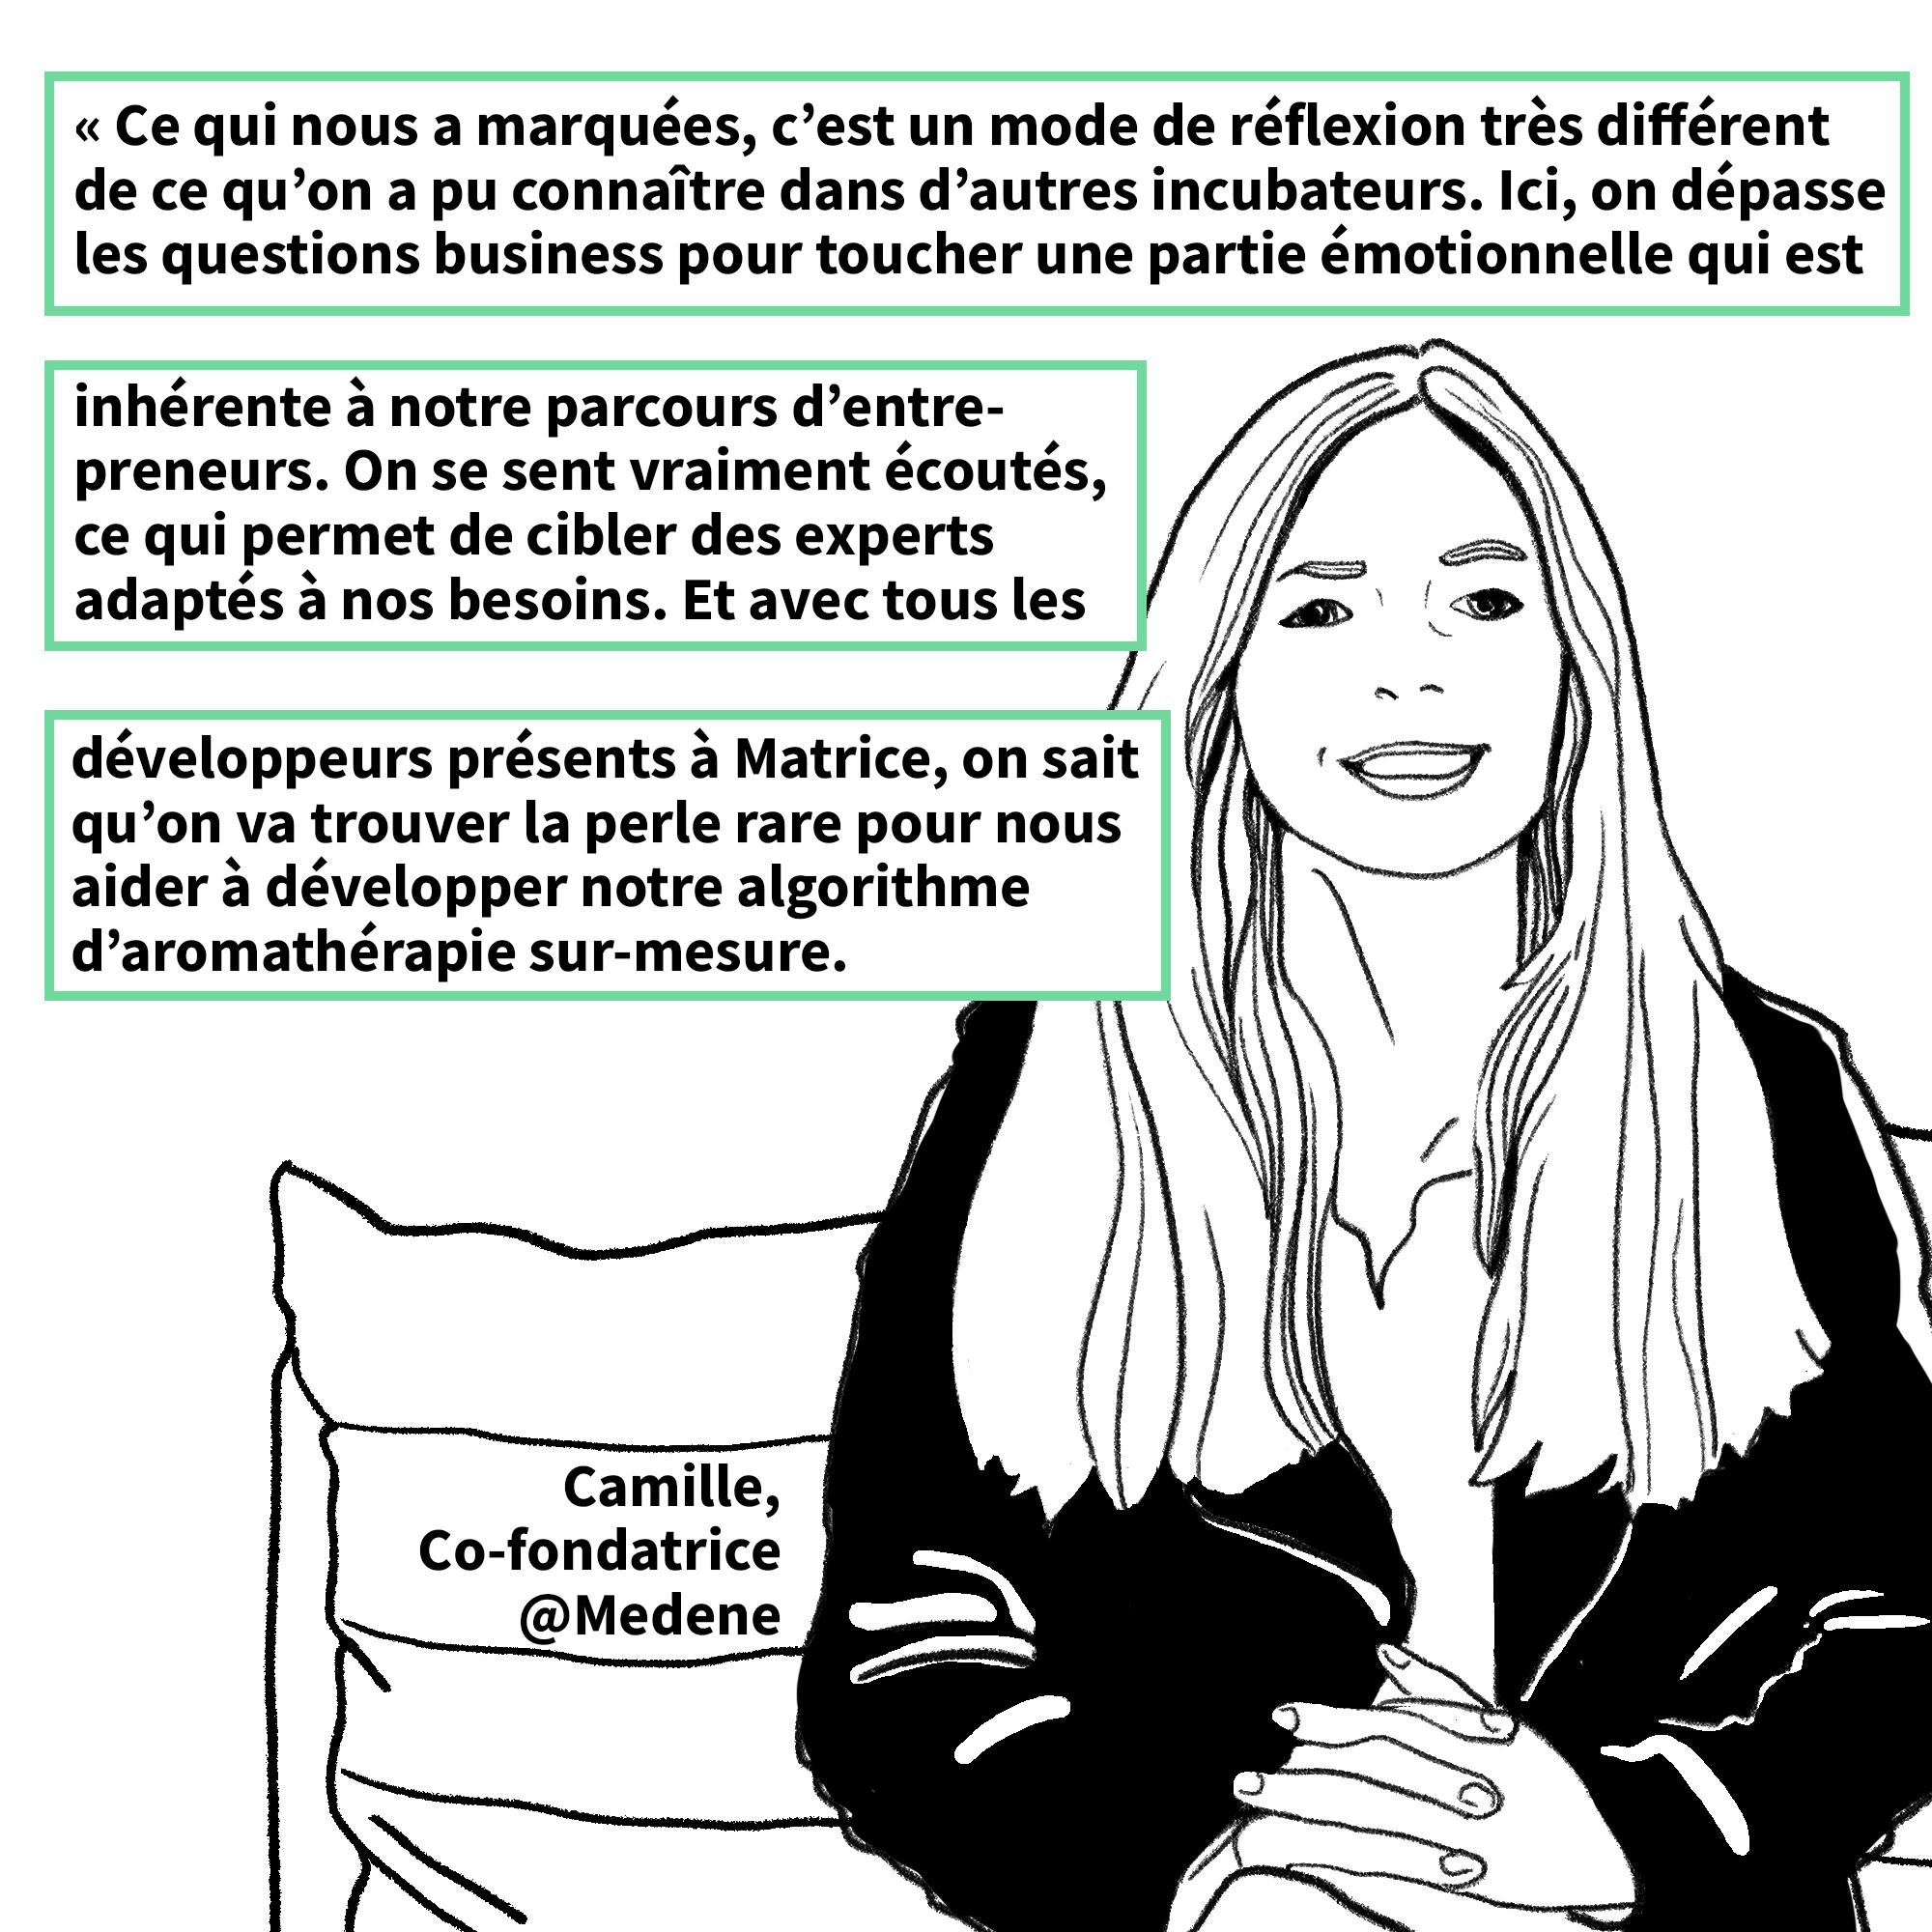 Camille Pereira de la startup Medene